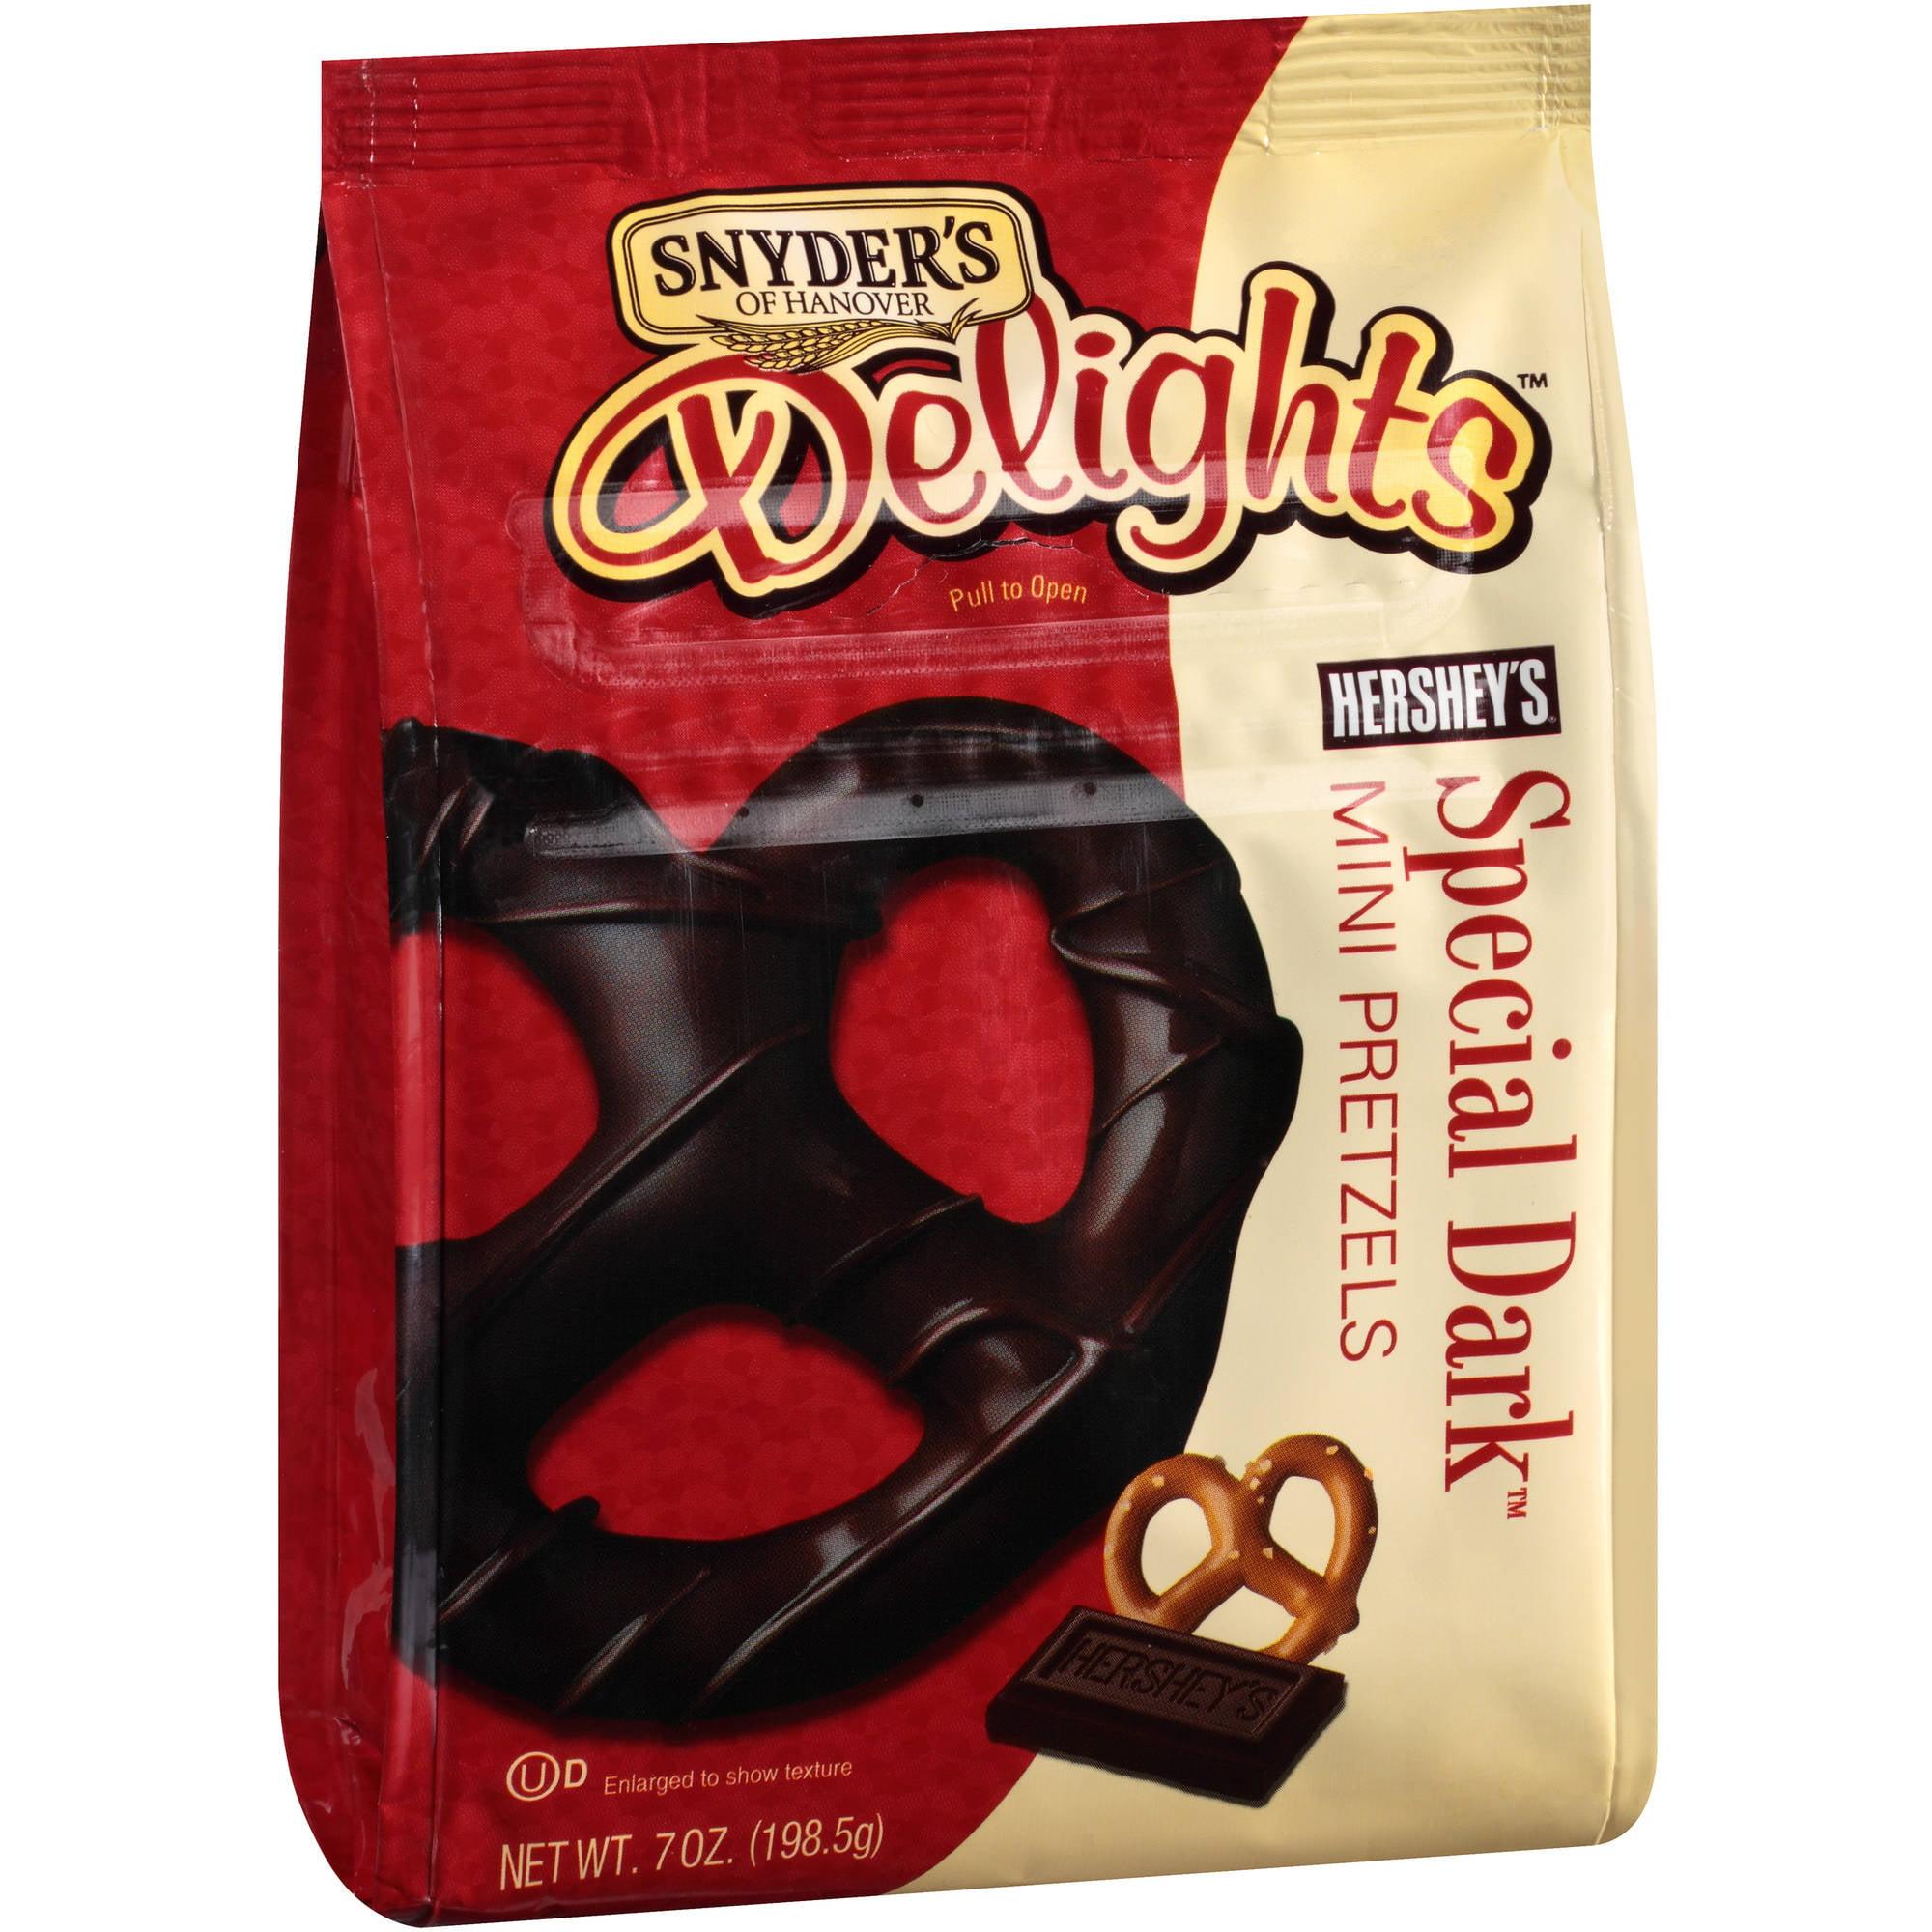 Synder's of Hanover Delights Hershey's Special Dark Mini Pretzels, 7 oz